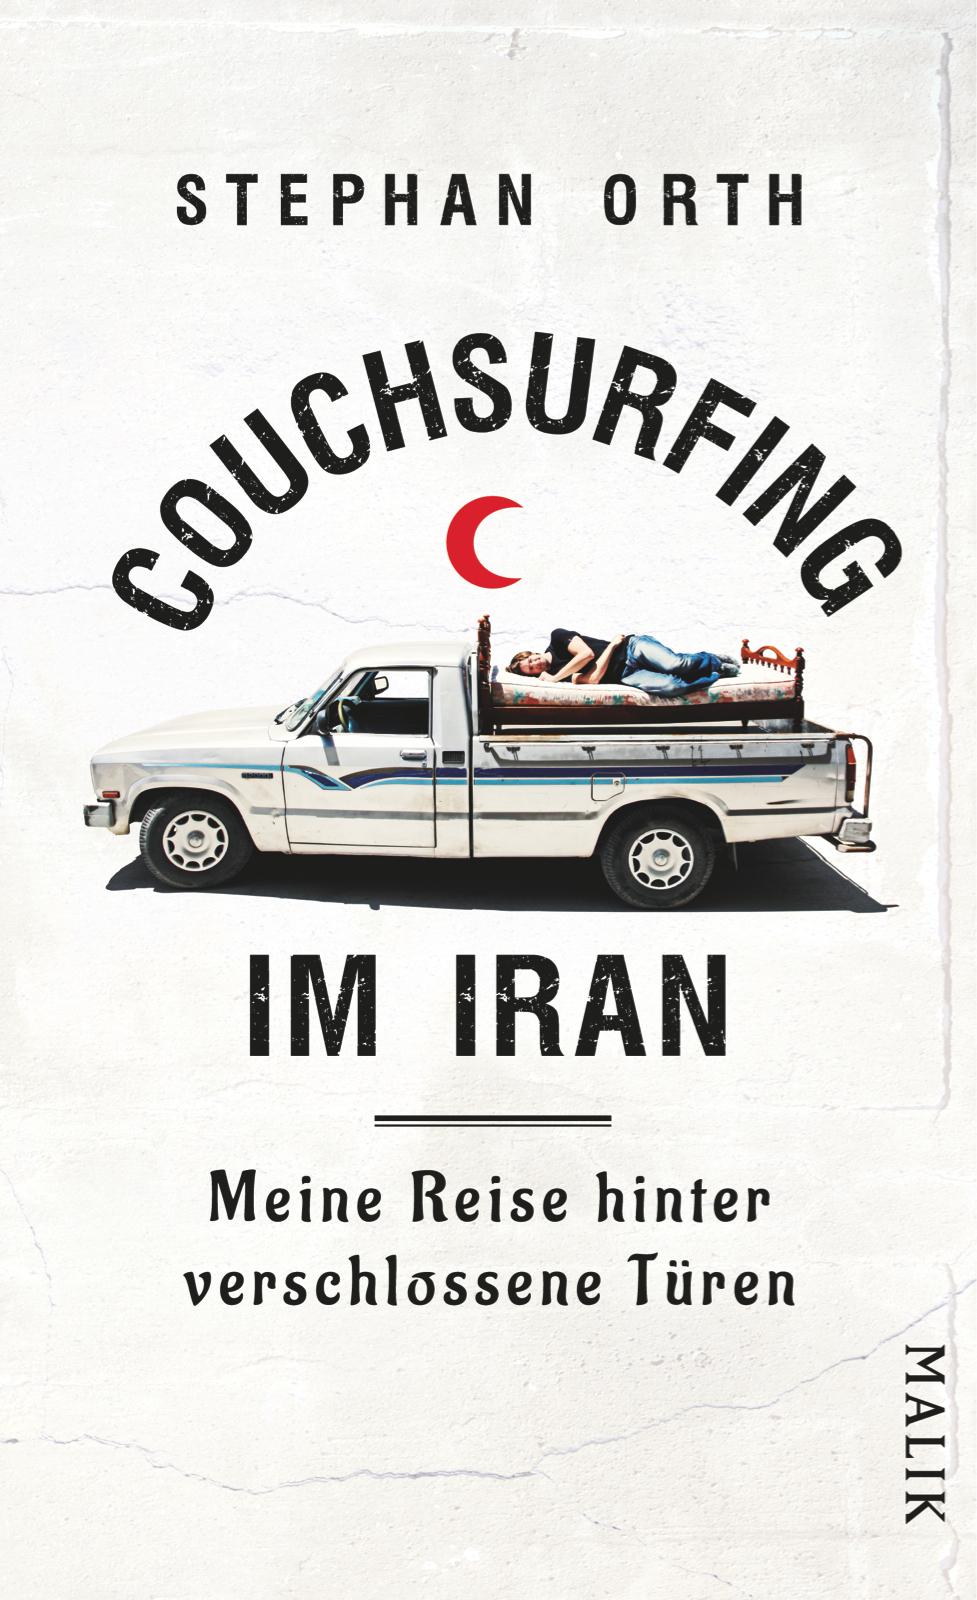 Stephan Orth | Bildervortrag: Couchsurfing im Iran